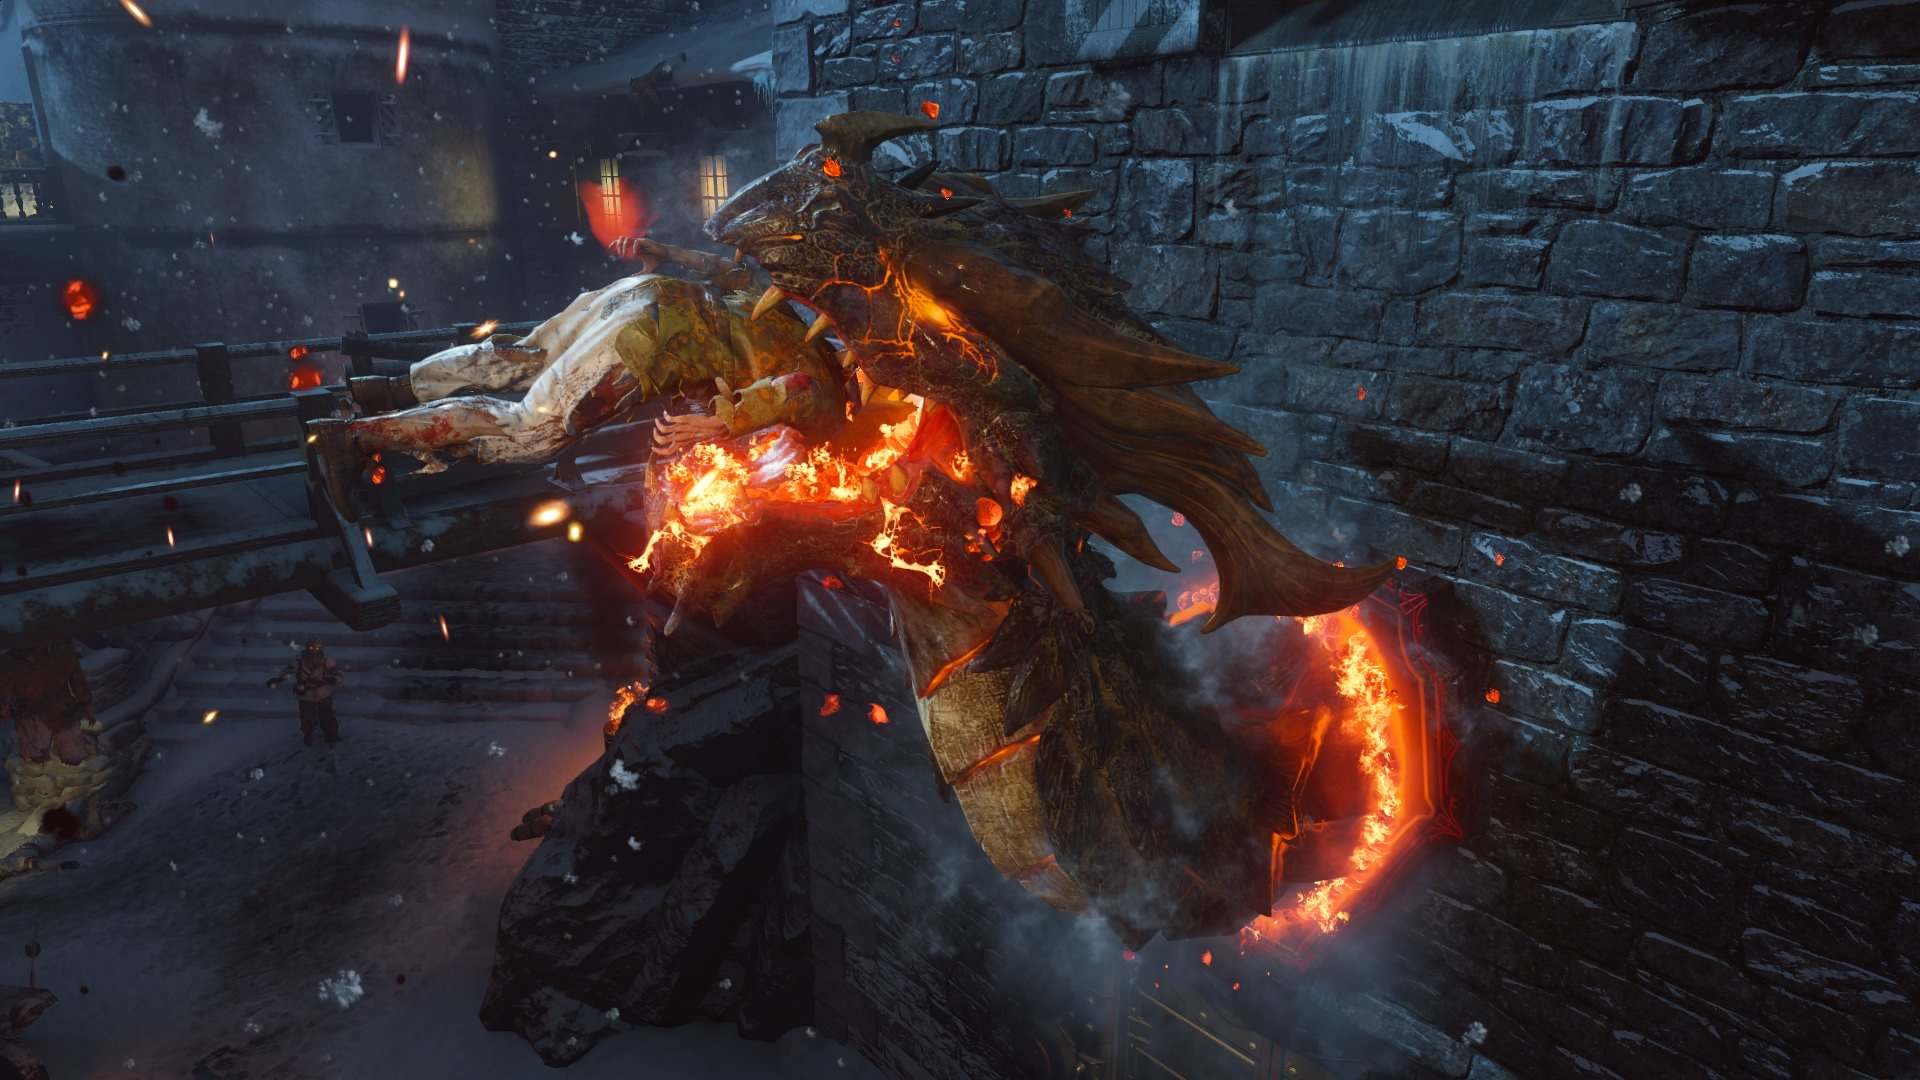 Parlons Des Dragons Sur Le Forum Call Of Duty Black Ops Iii